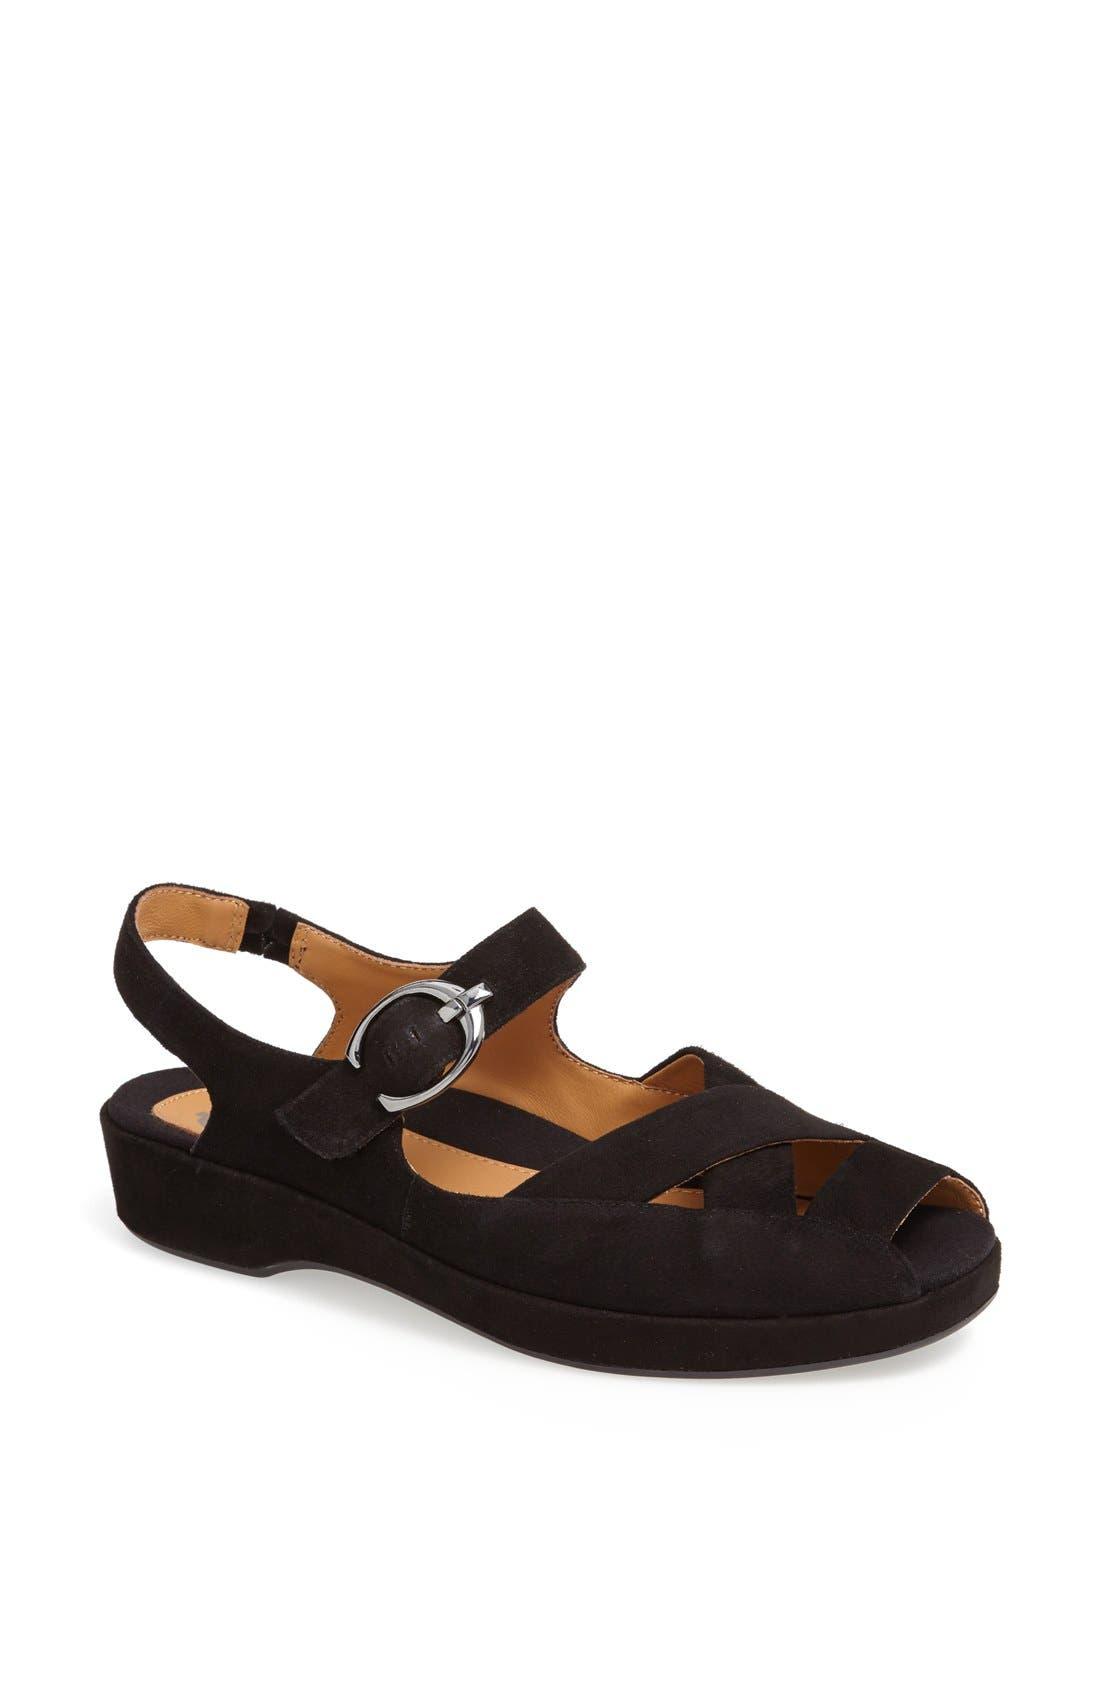 Alternate Image 1 Selected - Earthies® 'Malina' Sandal